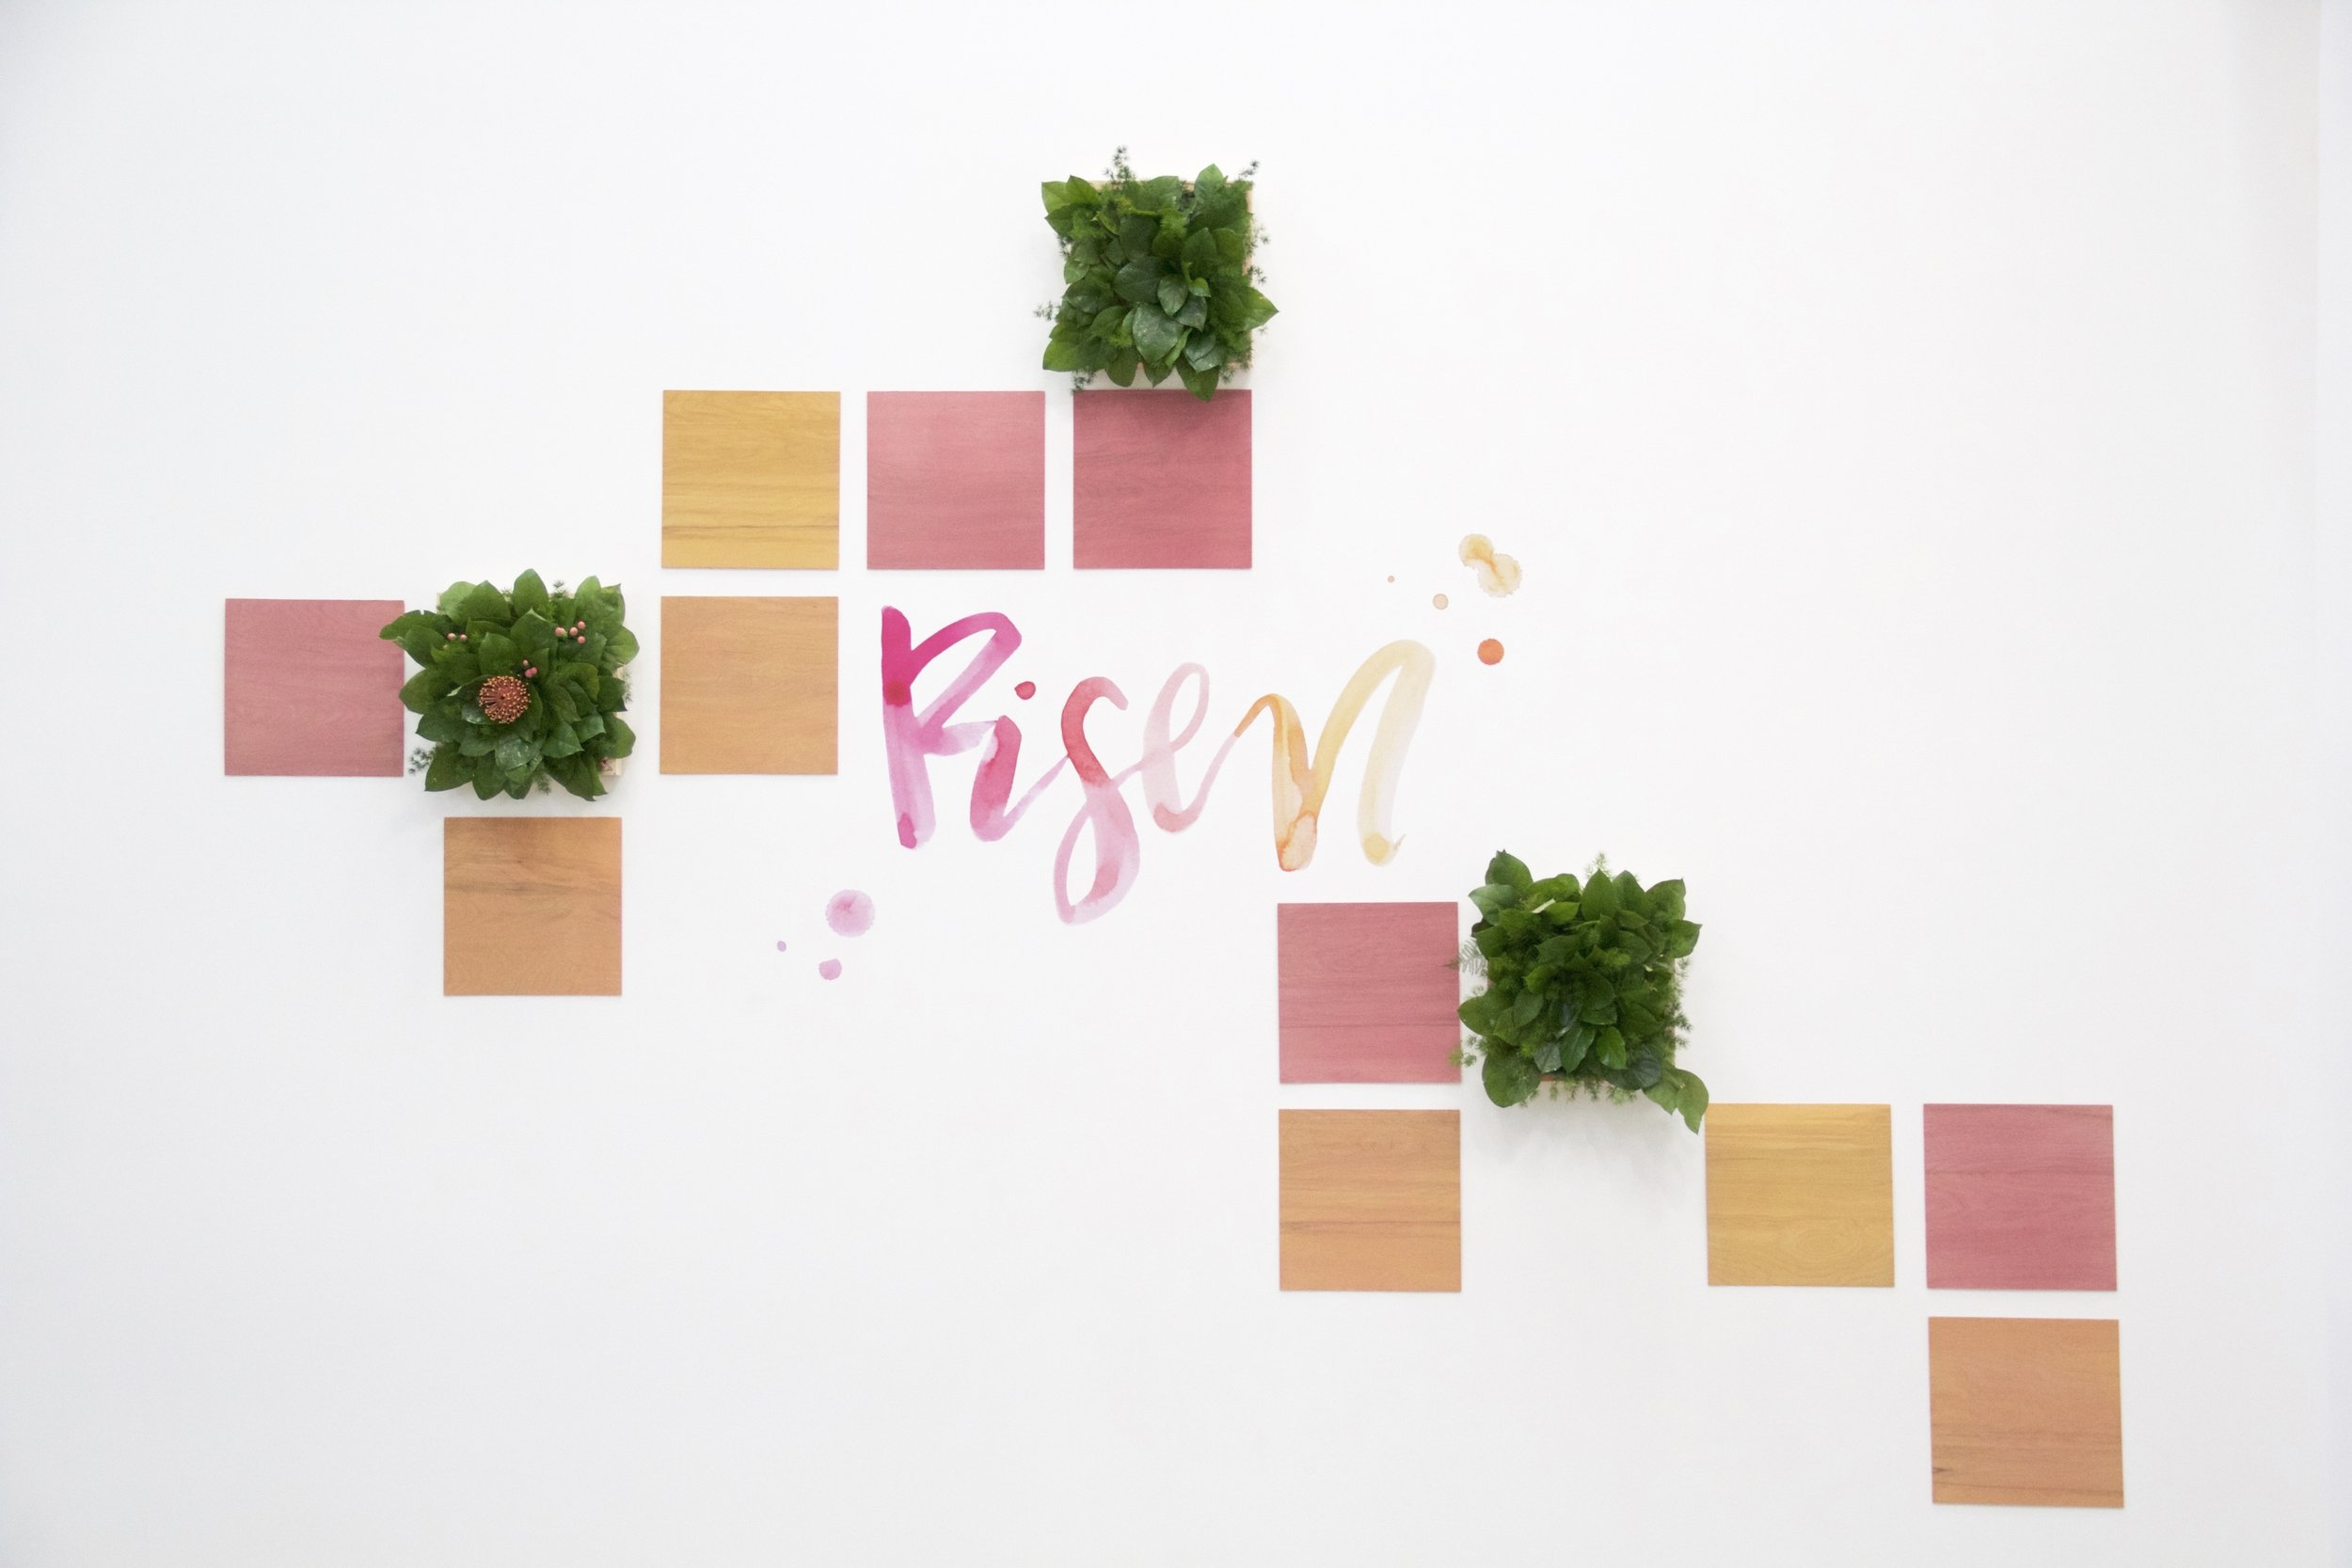 Easter Risen Installation | Relevant + Raw Installation | @RelevantRaw